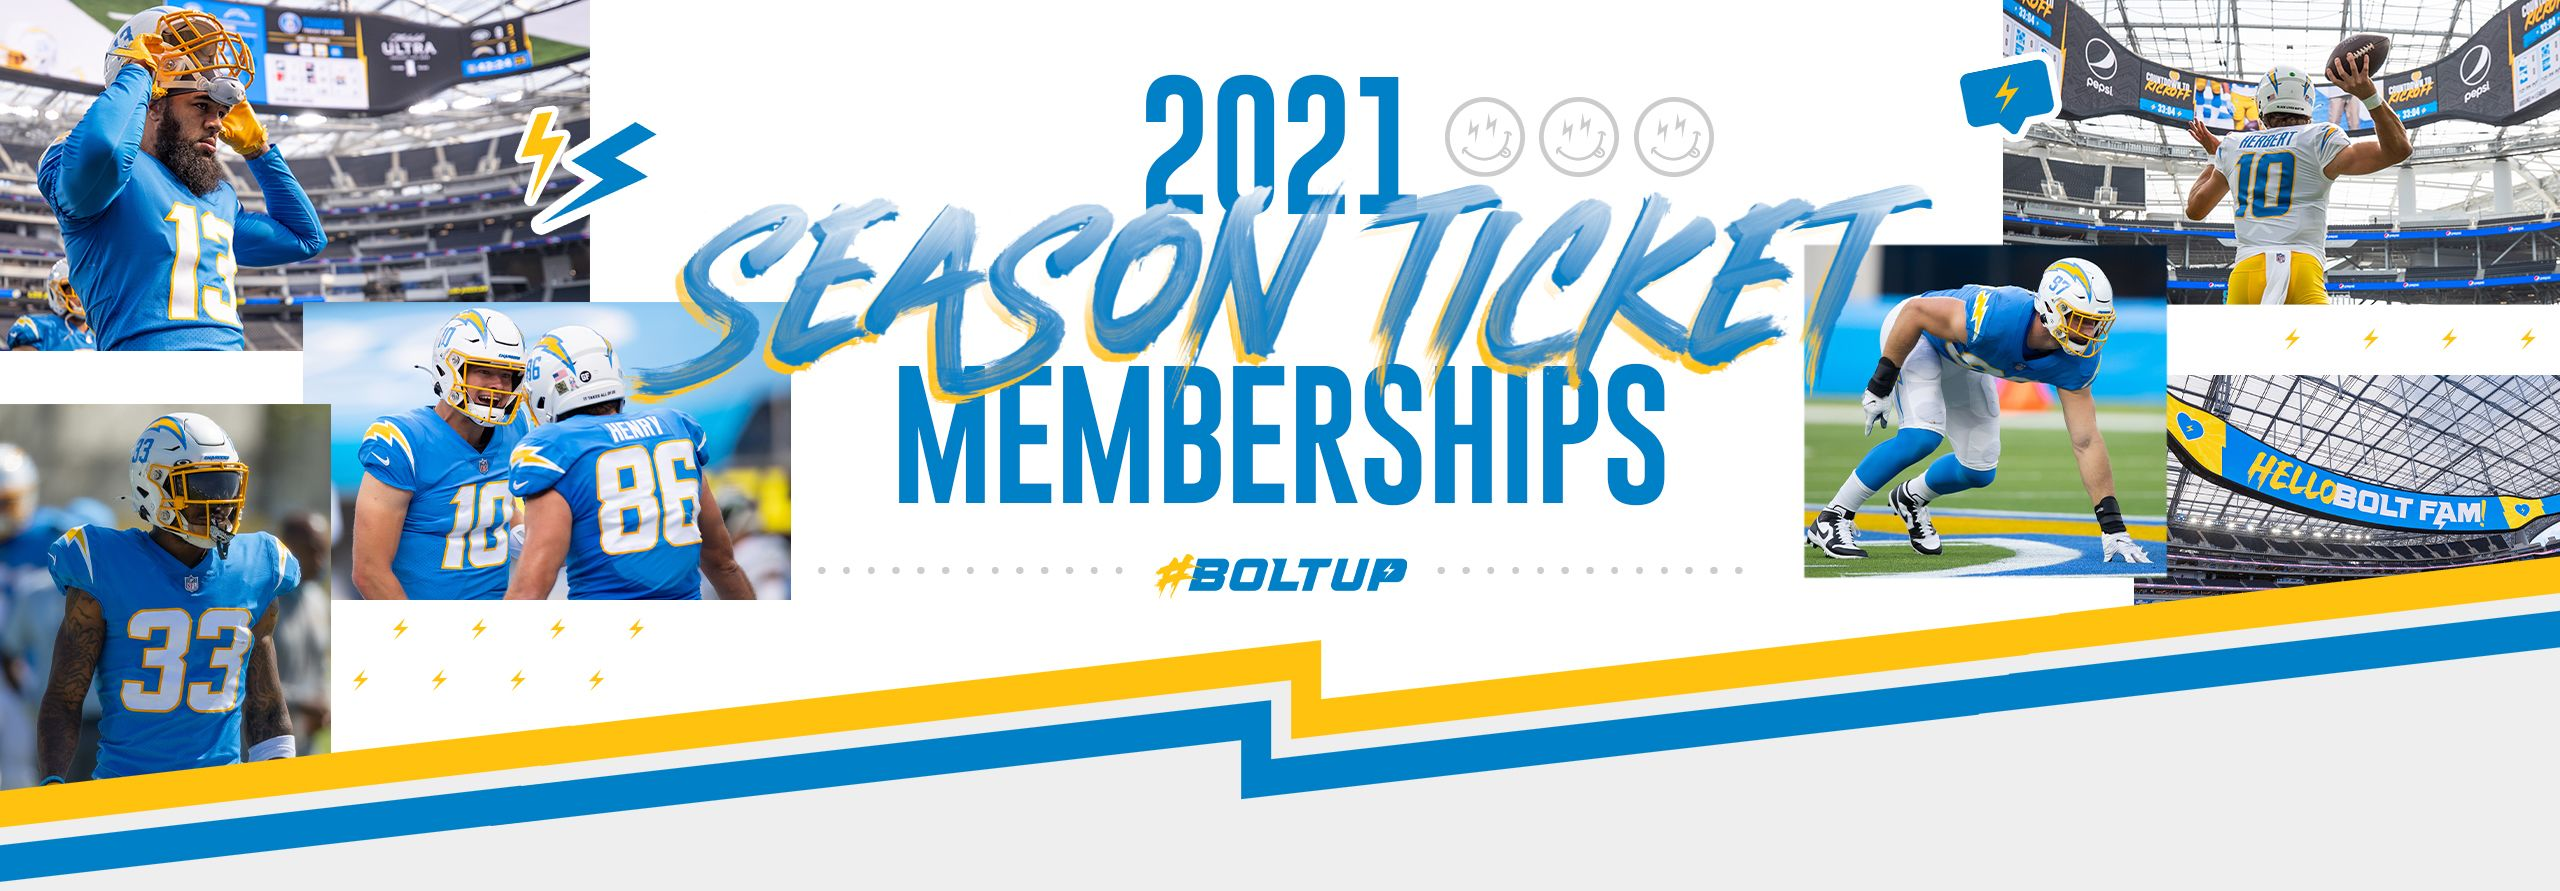 2021 Bolt Fam Season Ticket Memberships